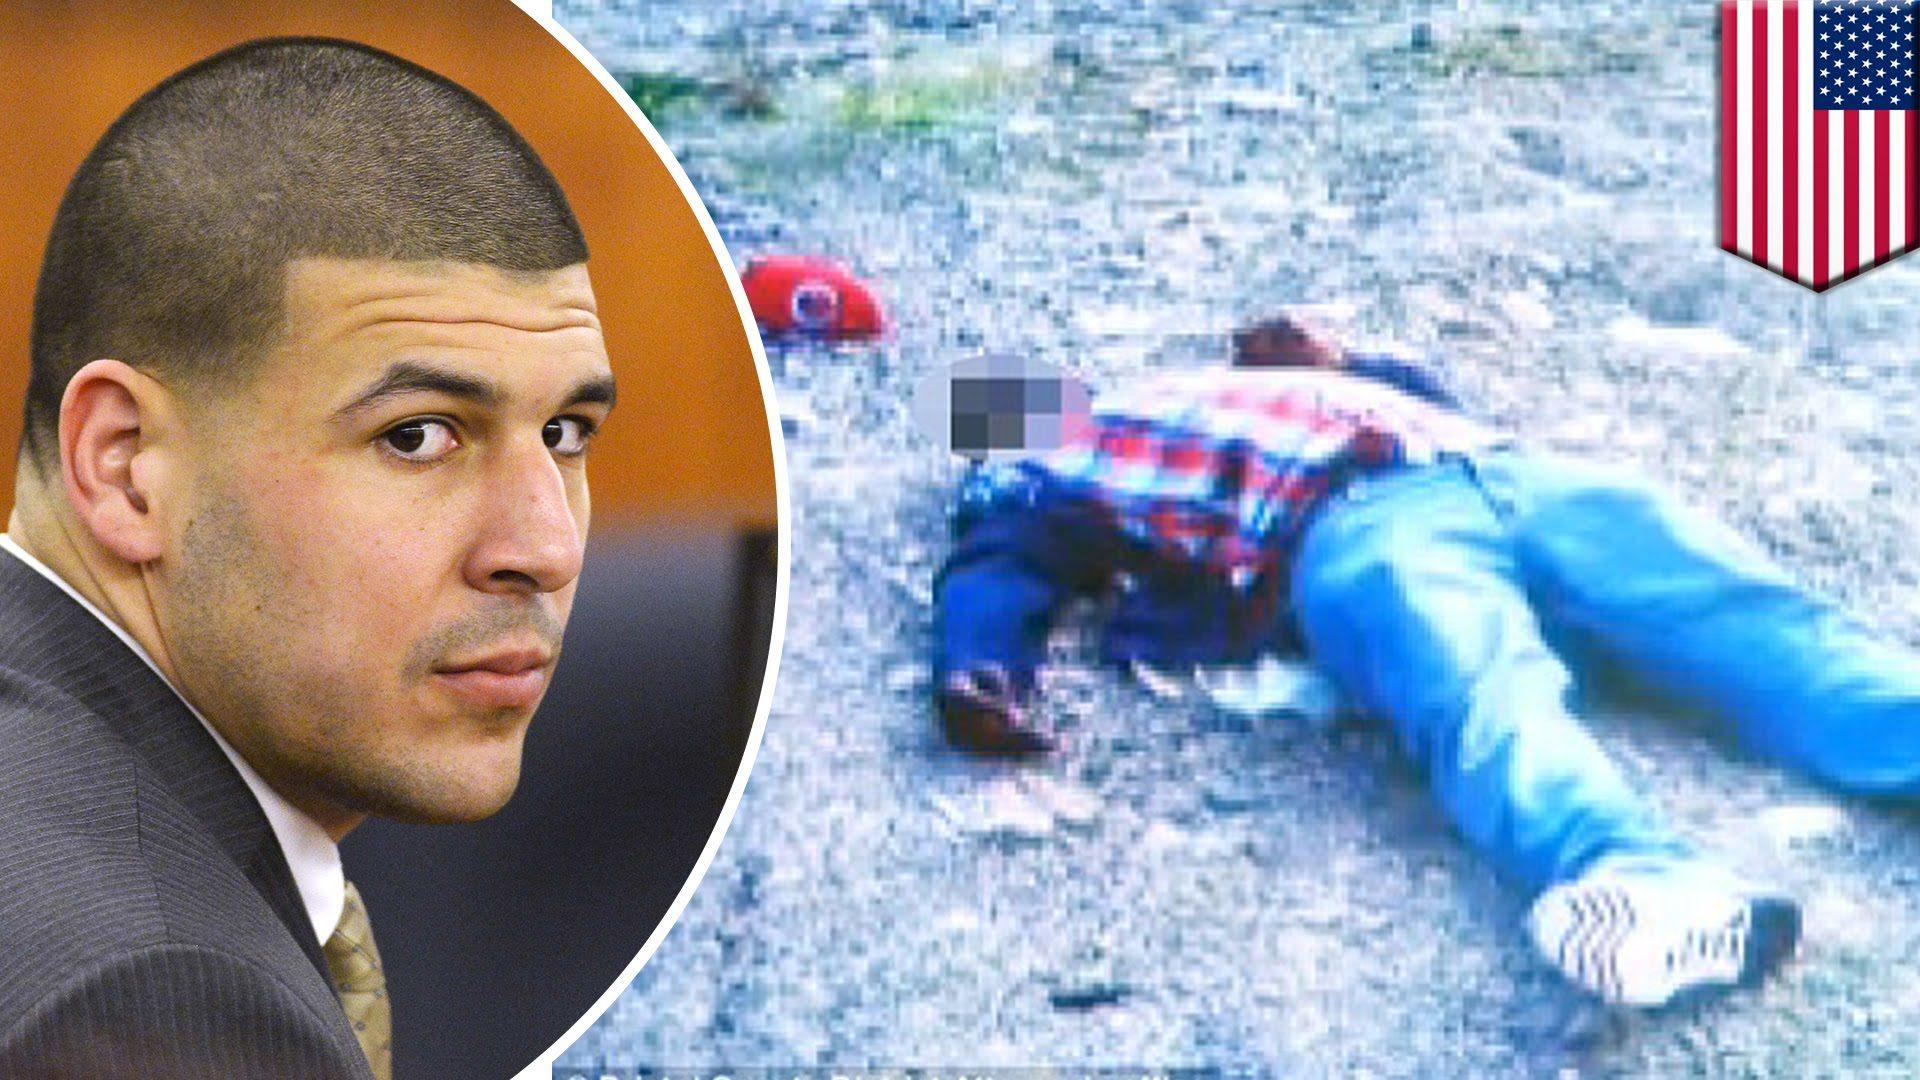 aaron hernandez murdered odin lloyd killed himself